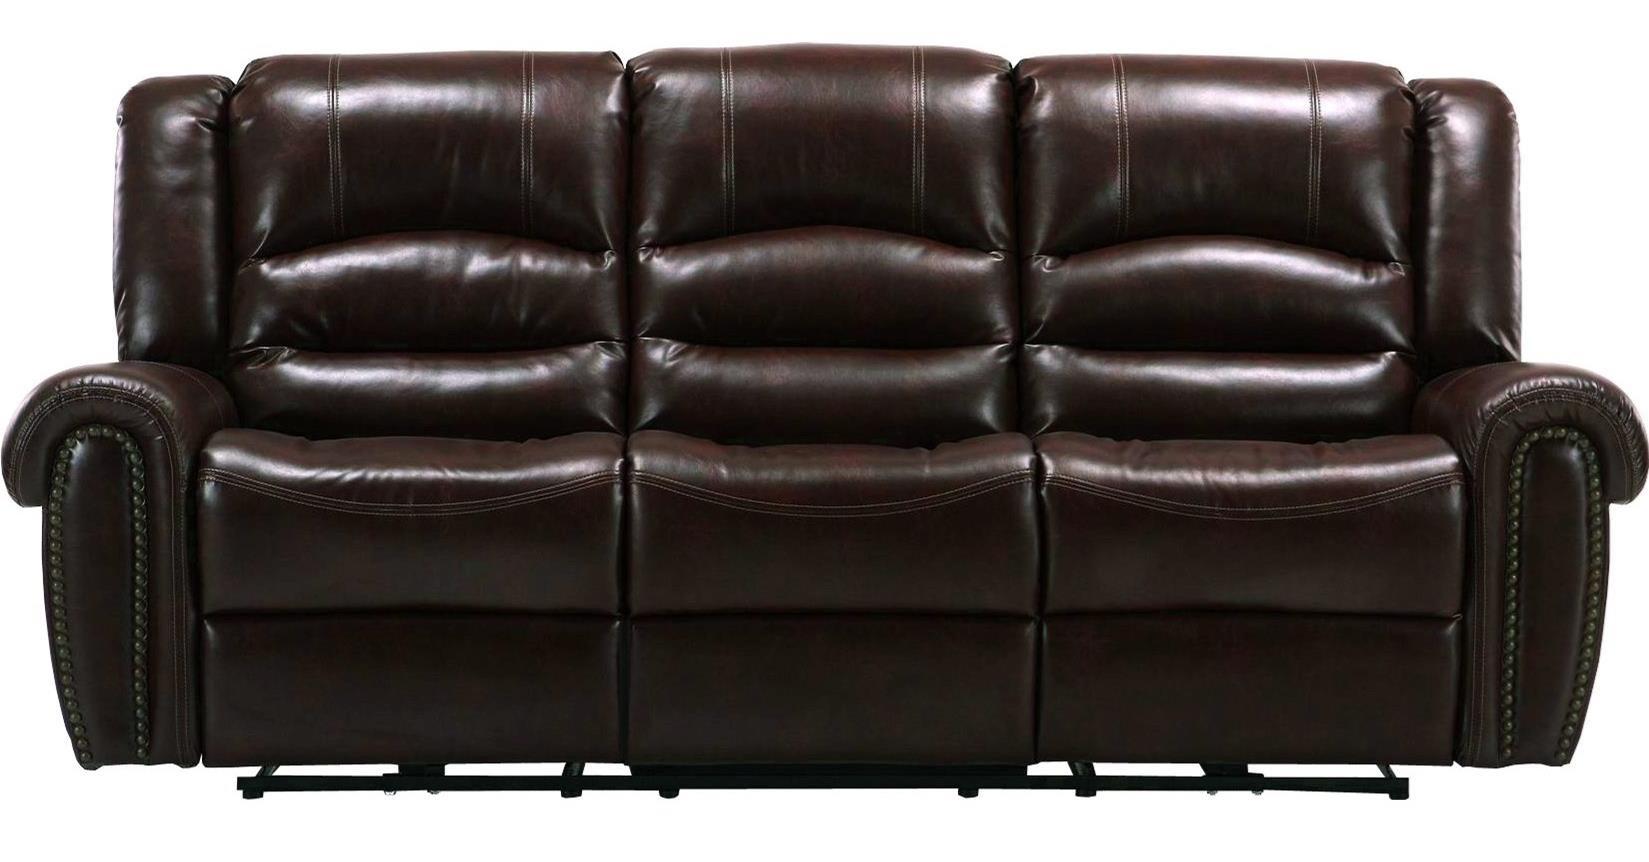 Parker Living Gershwin Power Reclining Dual Sofa - Item Number: MGER-832P-JA